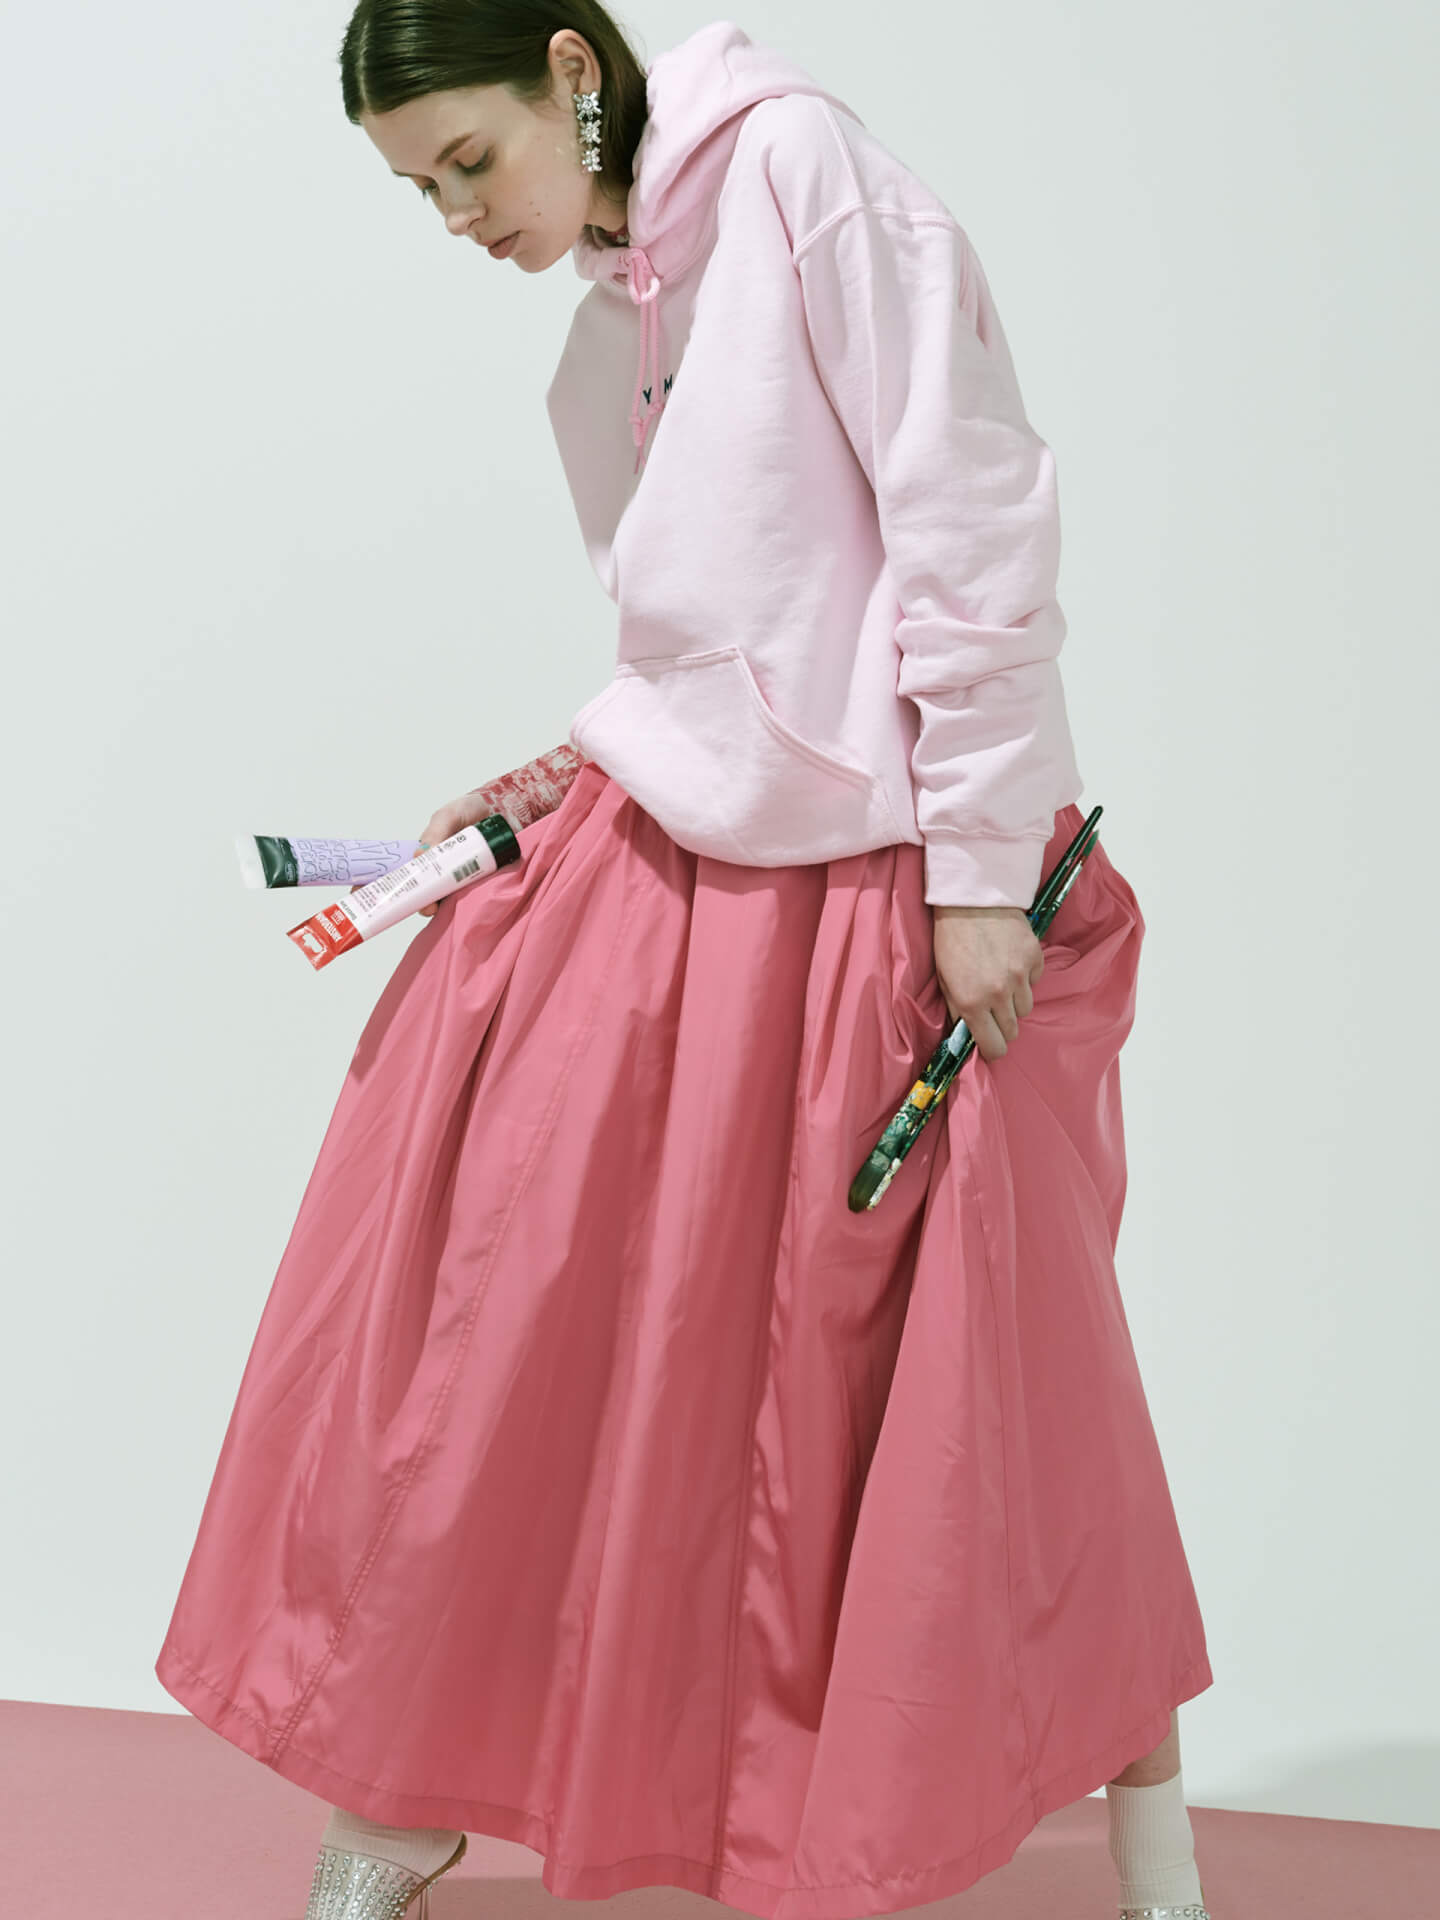 CHAIのベーシスト・YUUKIによるプロジェクト「YMYM」よりファッションブランドオープン!2021年春夏コレクション&描き下ろし絵画などの展示会も life210405_ymym_3